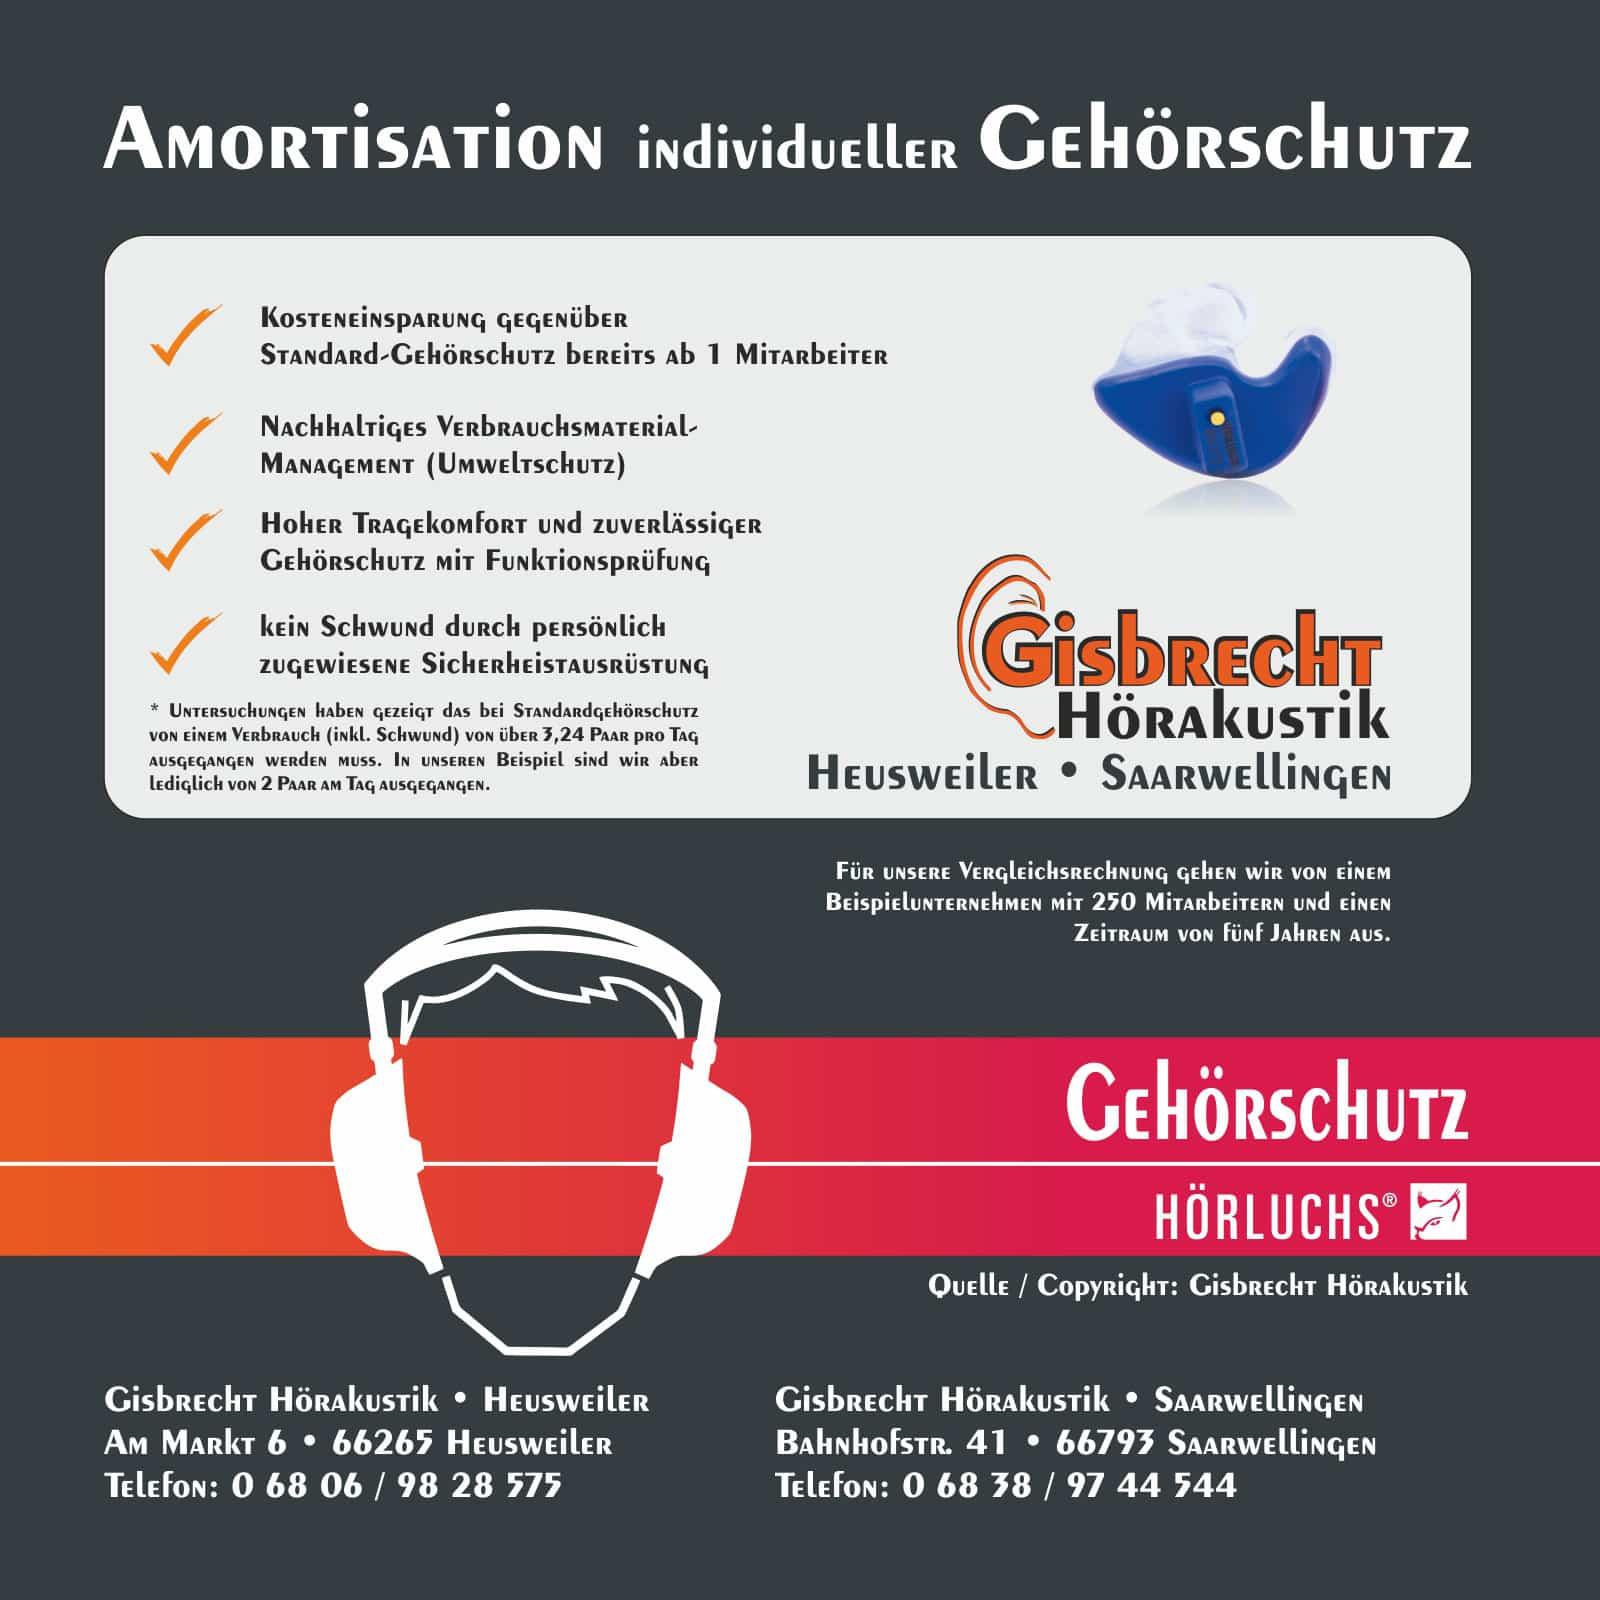 Gisbrecht Hörakustik - Amortisation von individuellem Gehörschutz Blatt 01